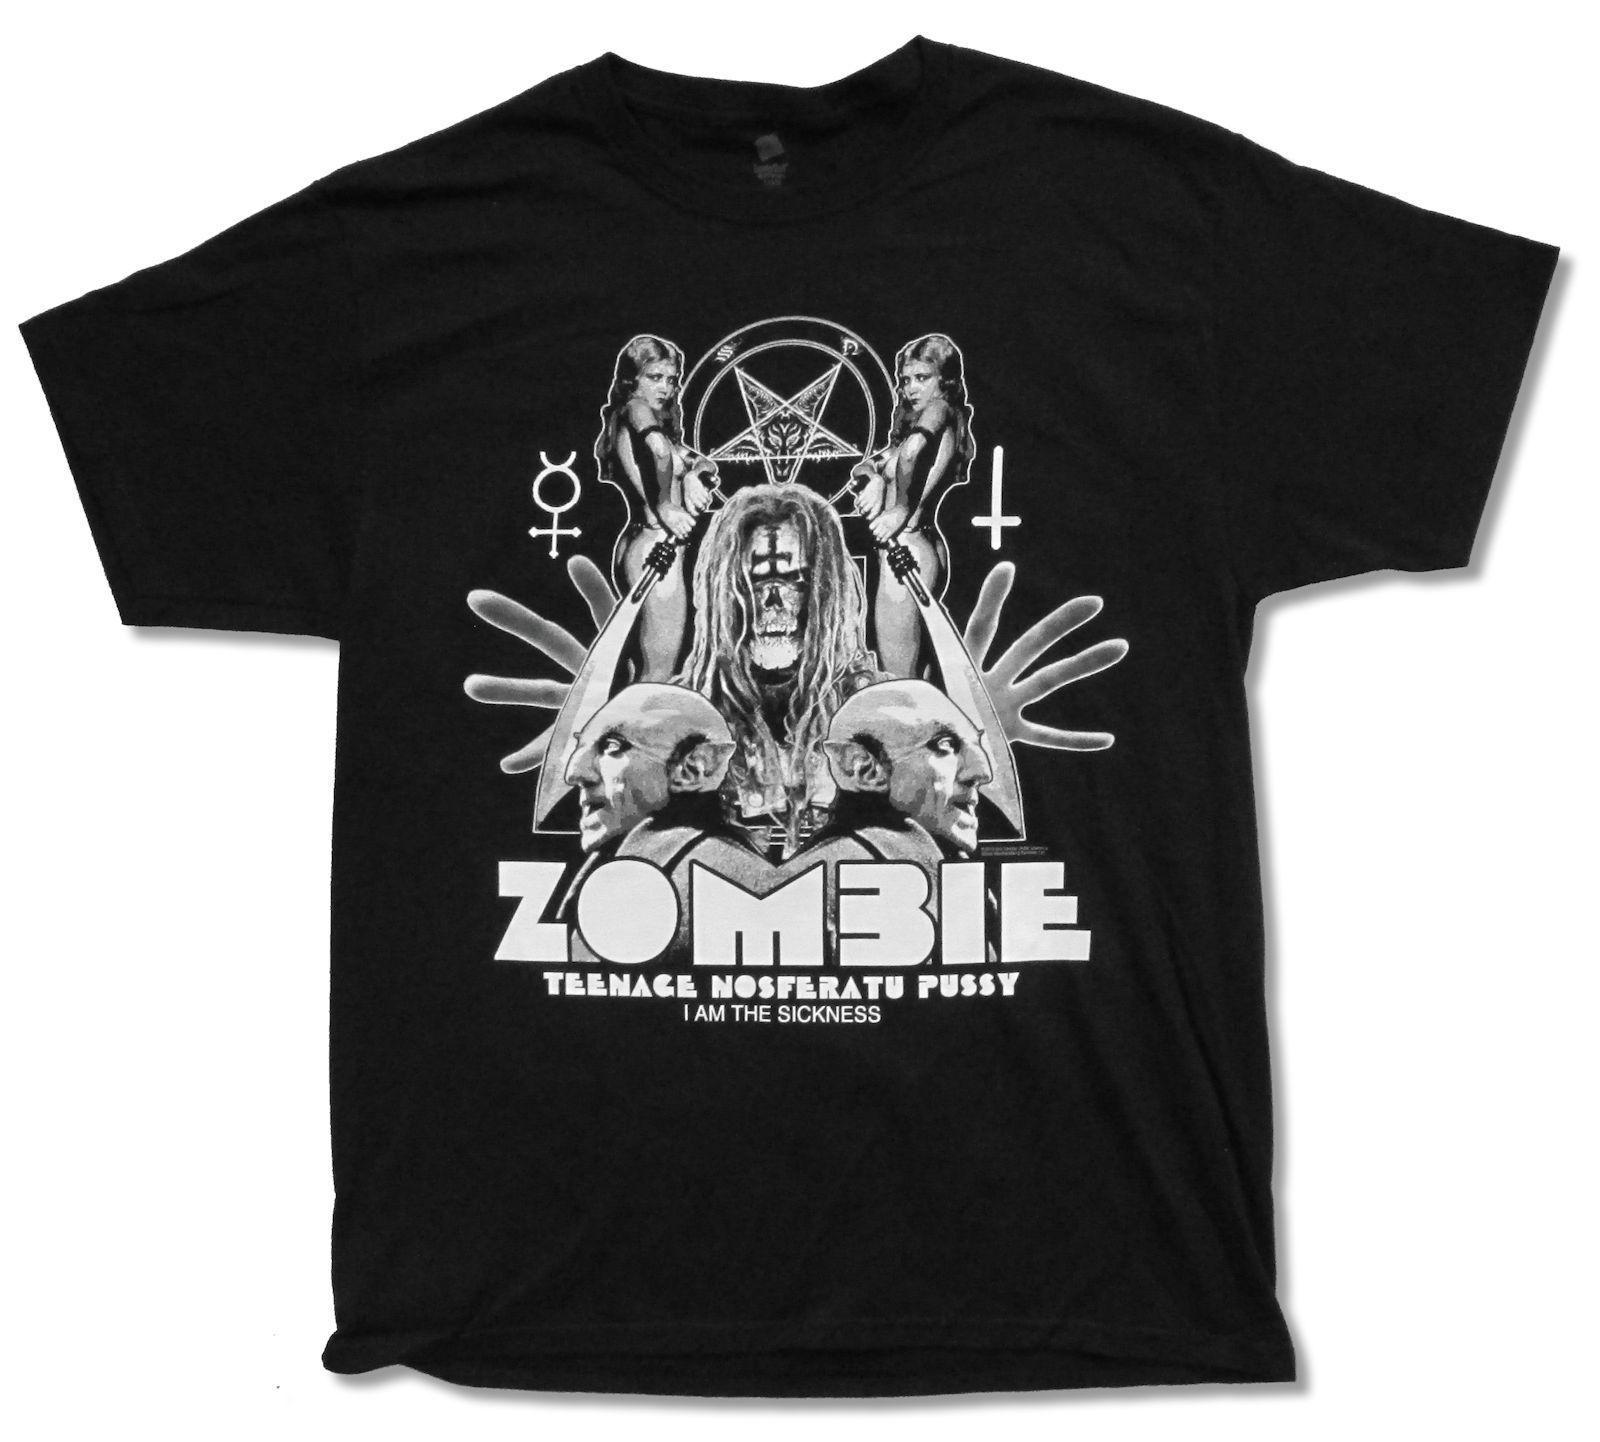 Rob Zombie Shadow Black T Shirt New Official Teenage Nosferatu Adult